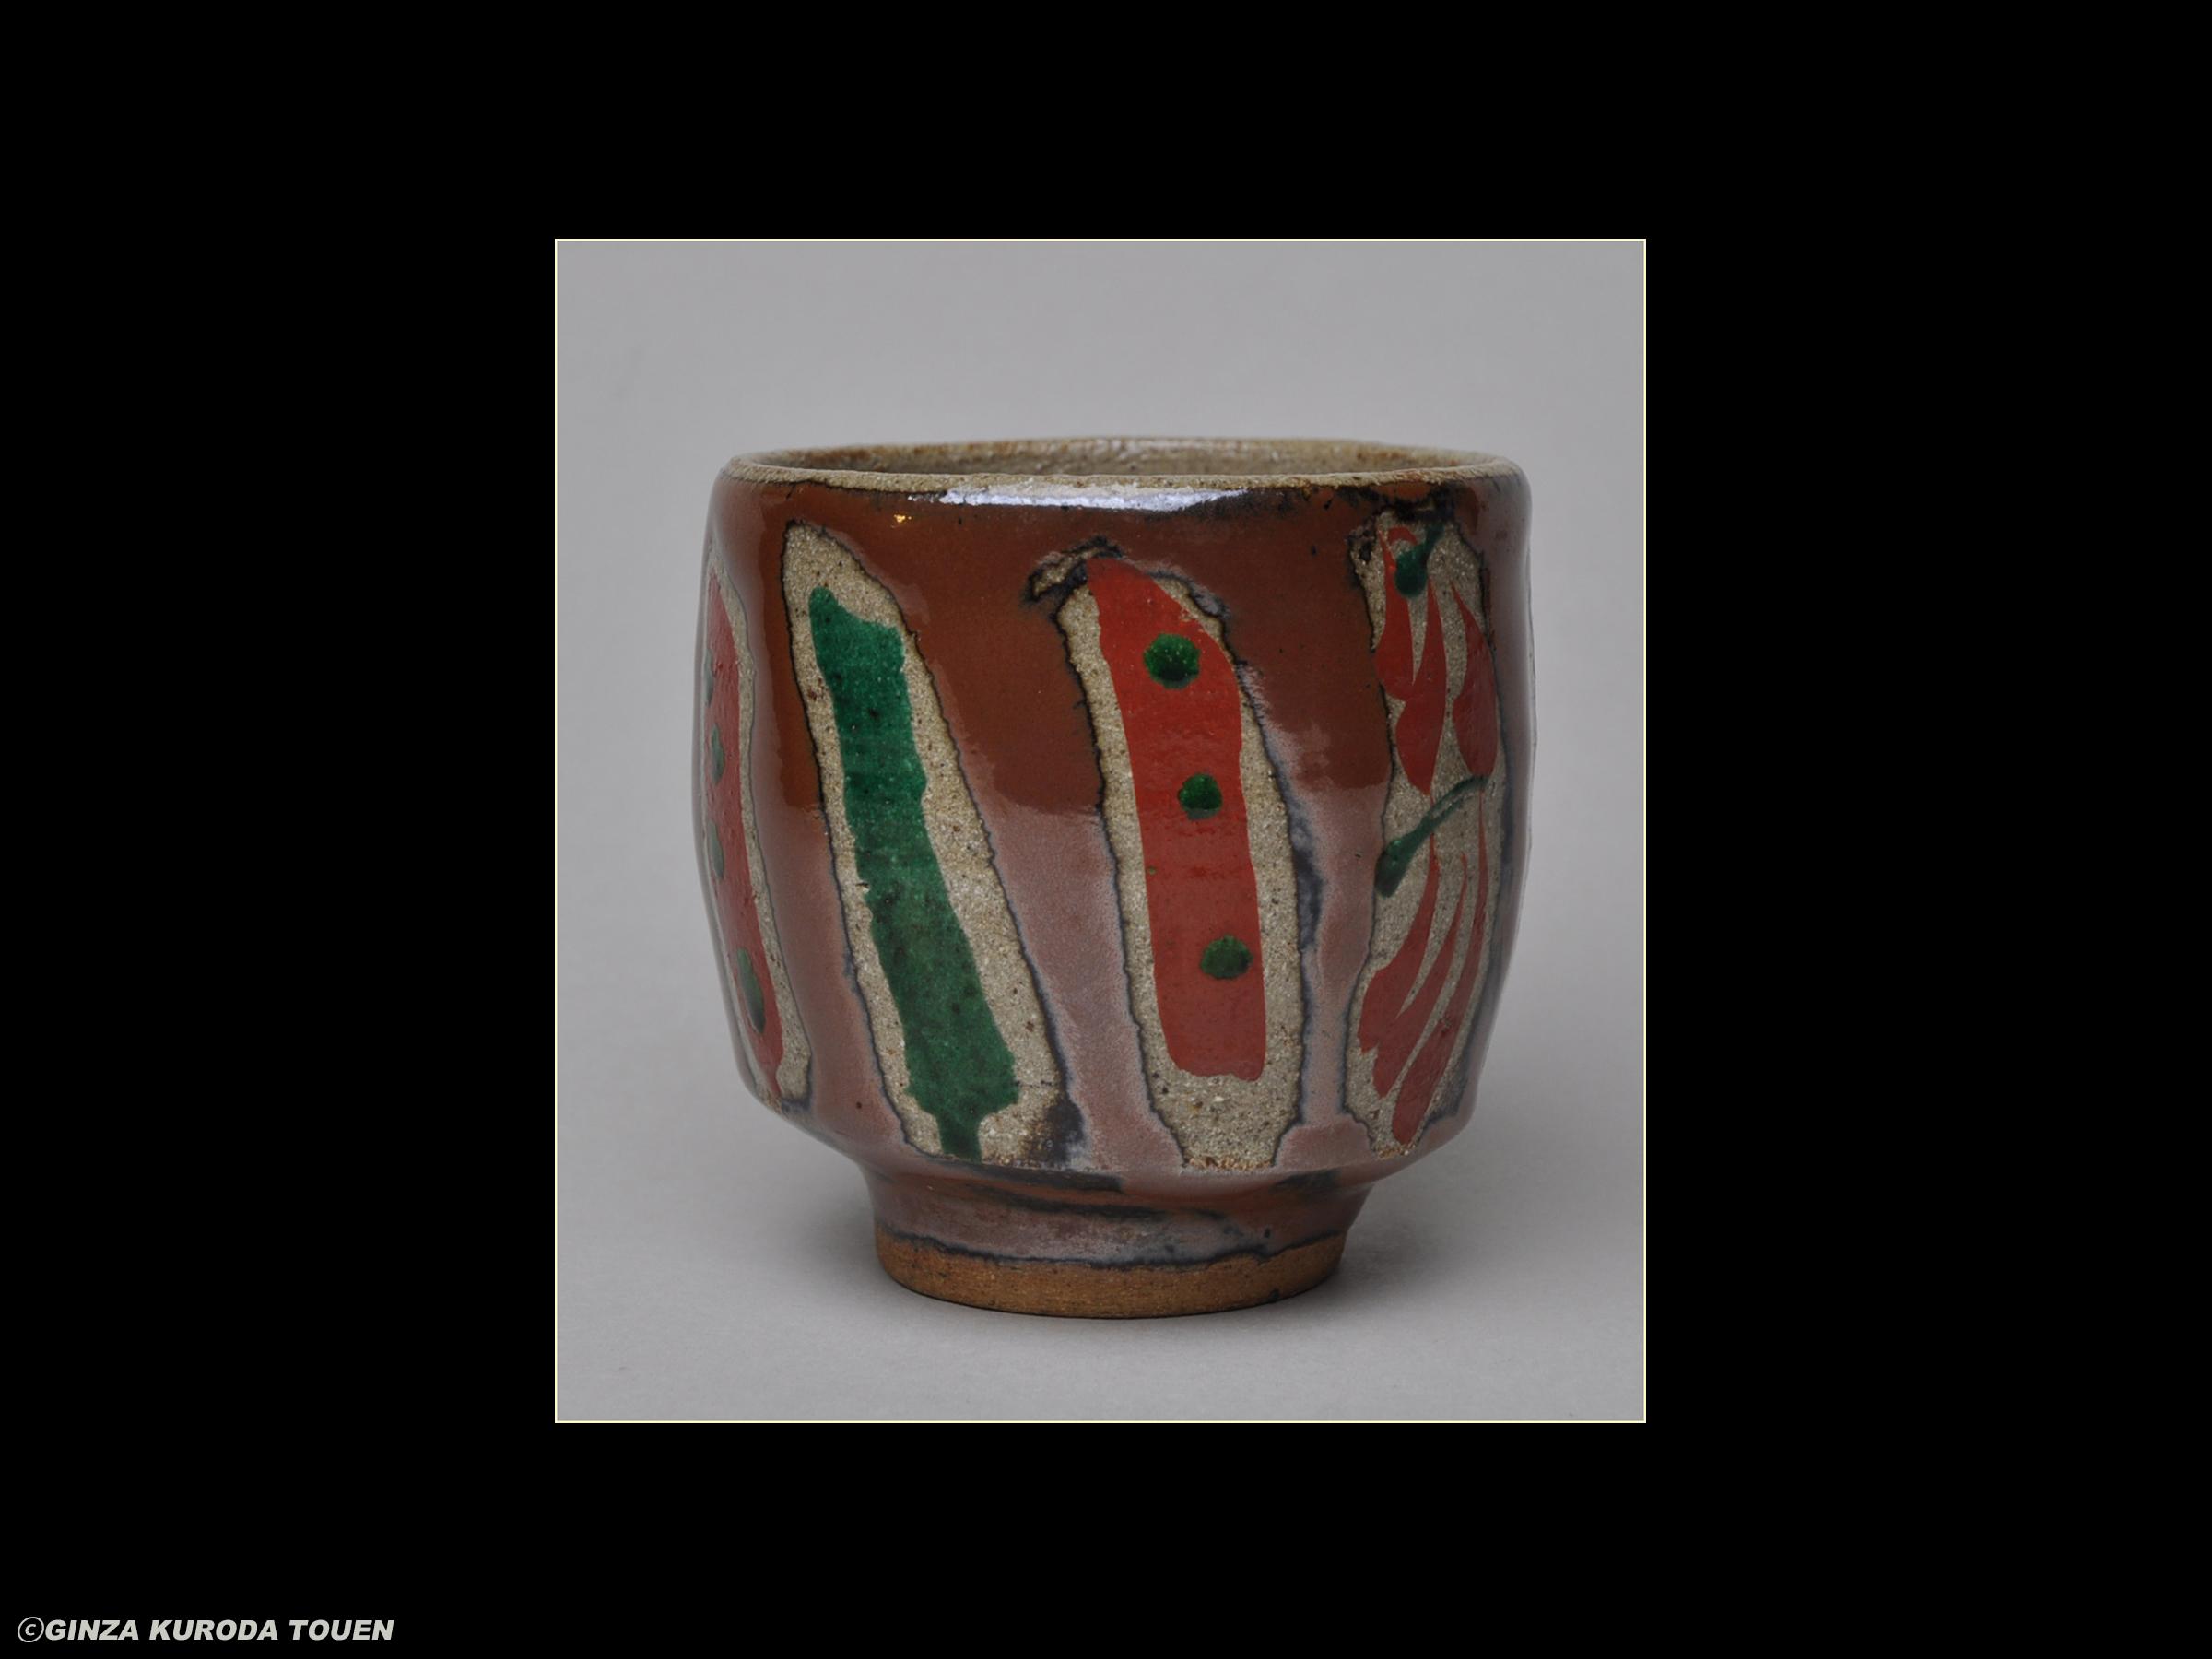 Shoji Hamada: Tea cup, Kaki glaze with red painting